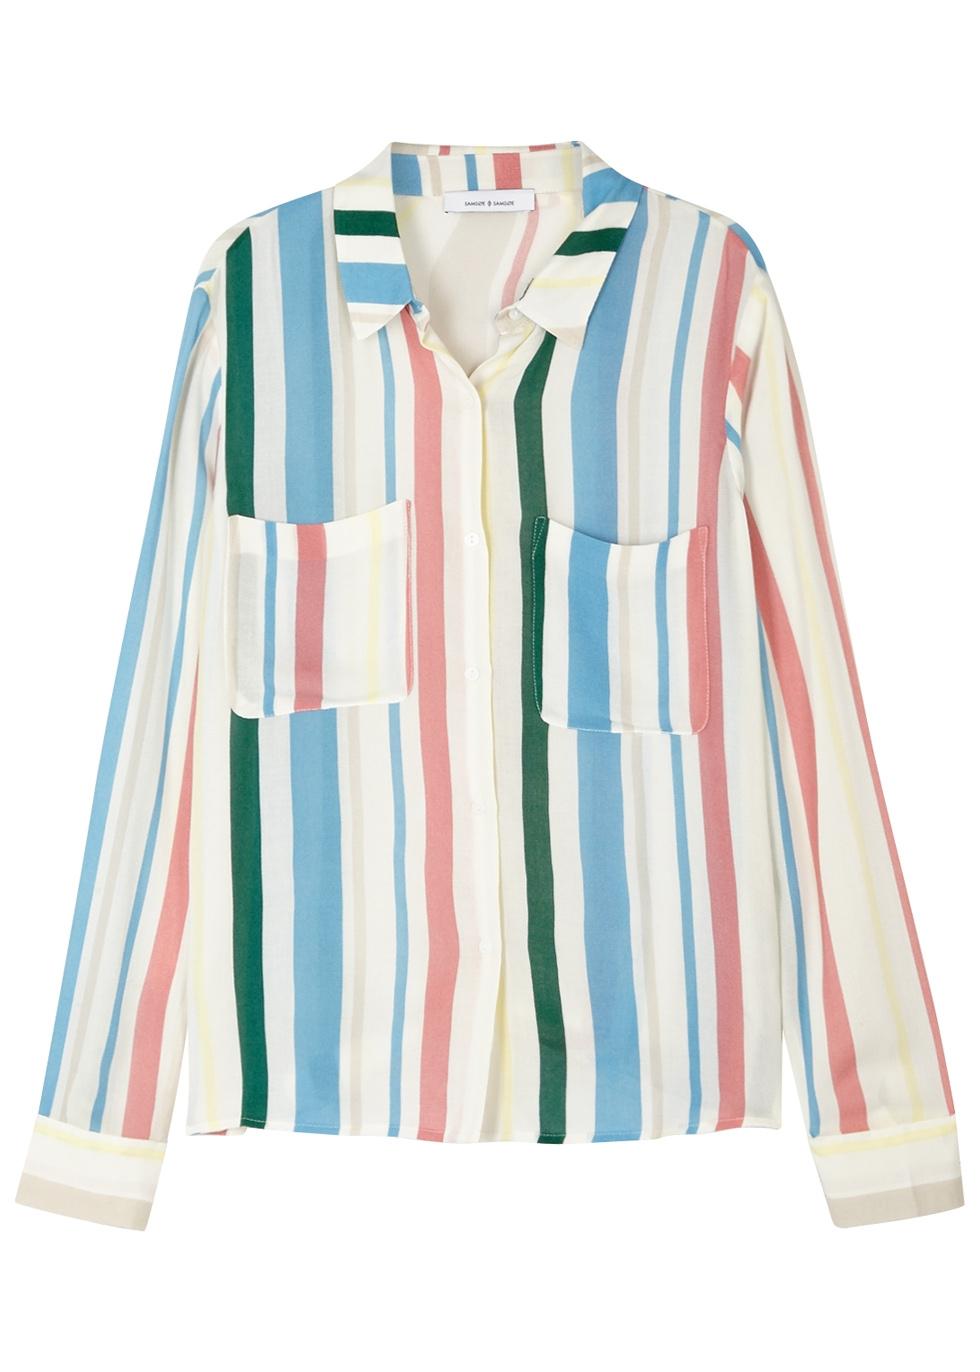 SAMS0E & SAMS0E Milly Striped Jersey Shirt